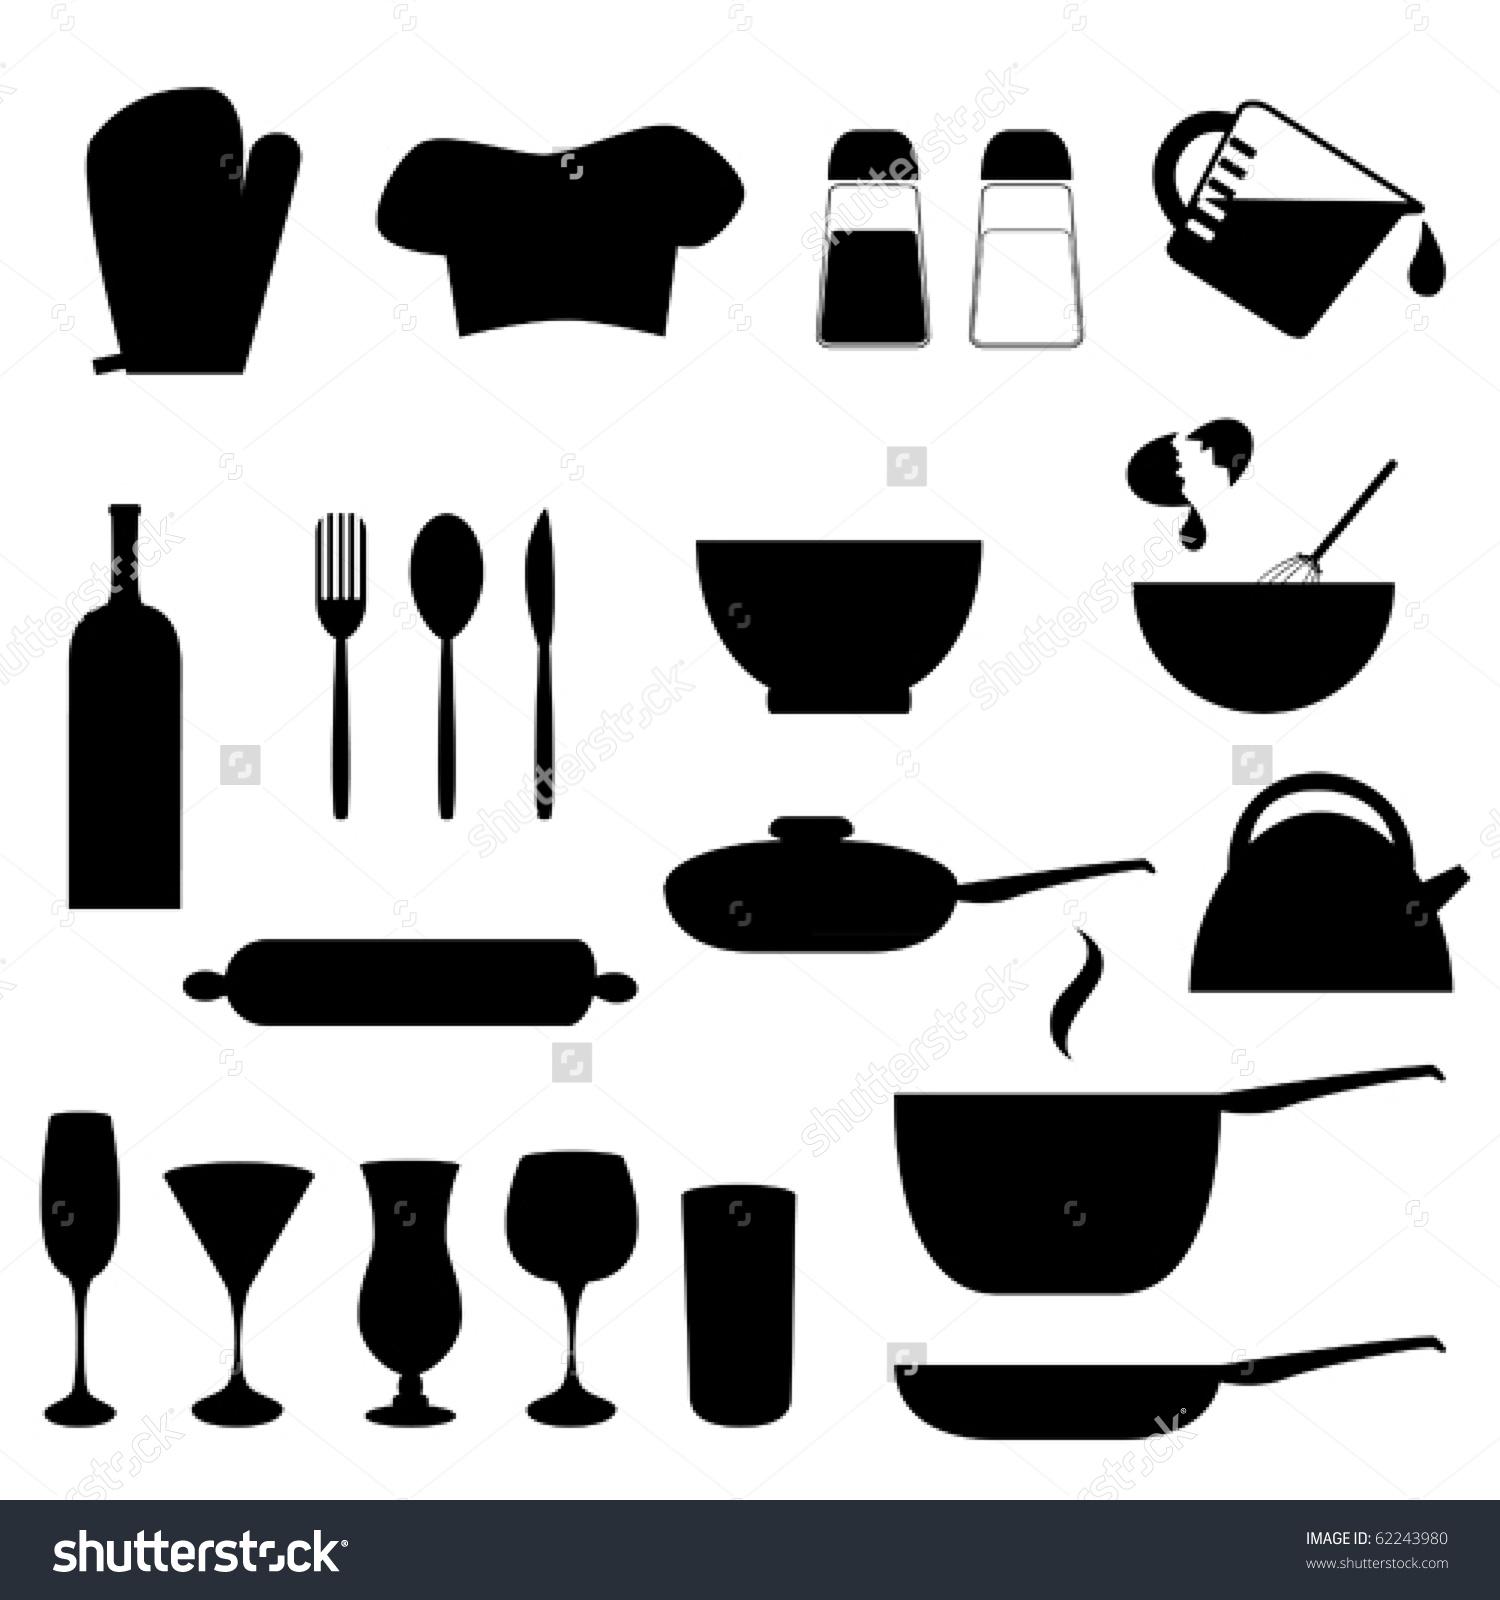 Various Kitchen Utensils Silhouette Stock Vector 62243980.